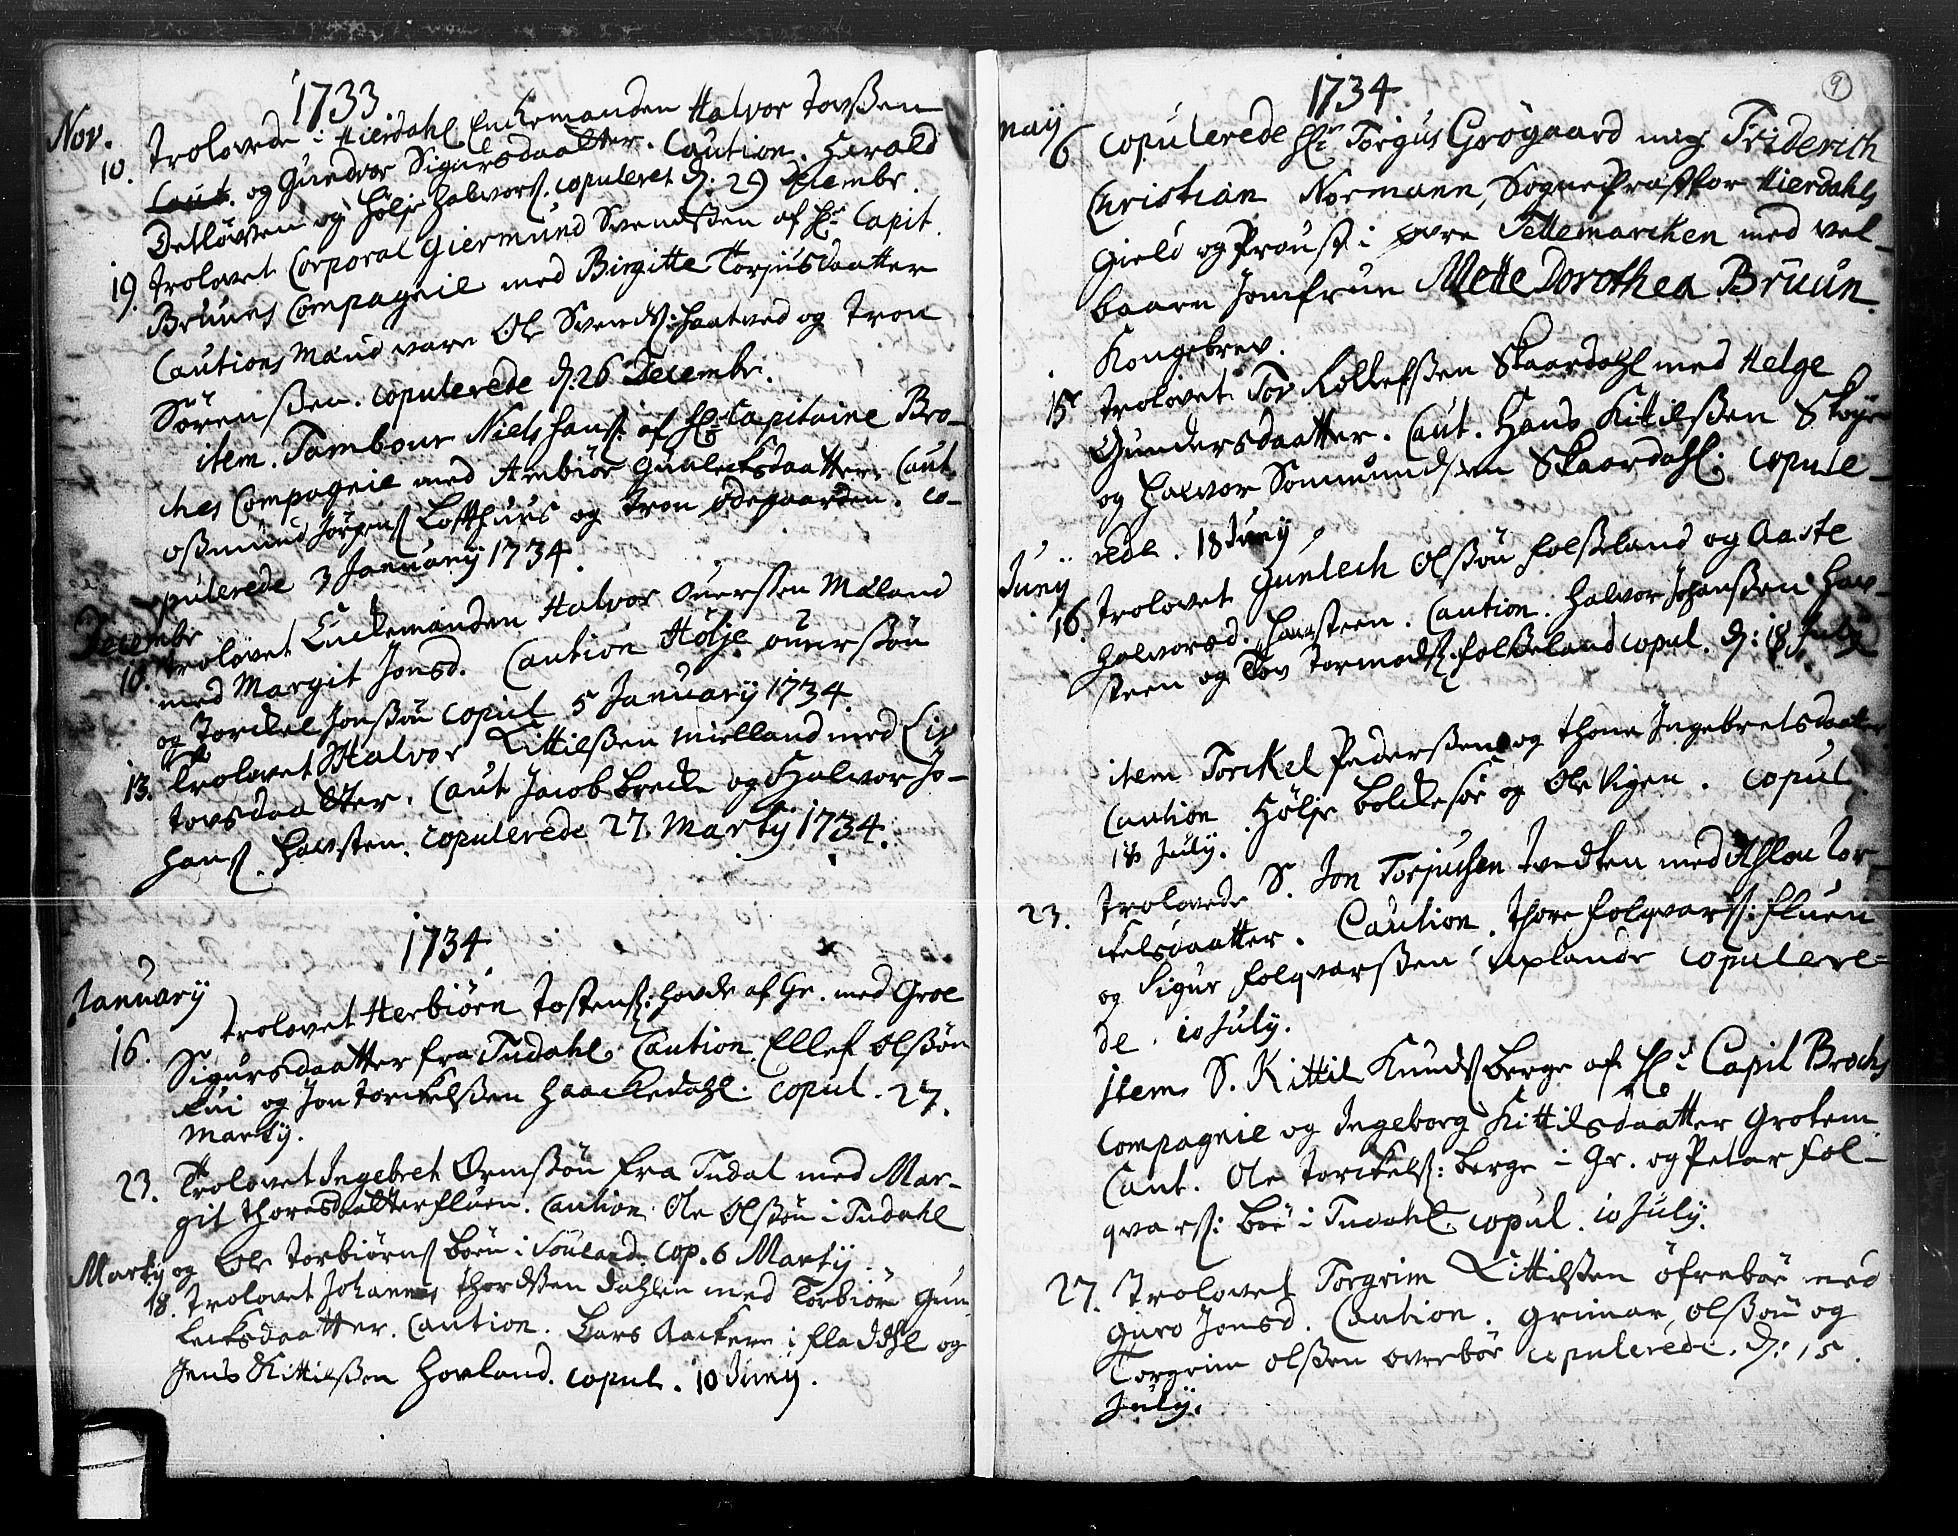 SAKO, Hjartdal kirkebøker, F/Fa/L0004: Ministerialbok nr. I 4, 1727-1795, s. 9